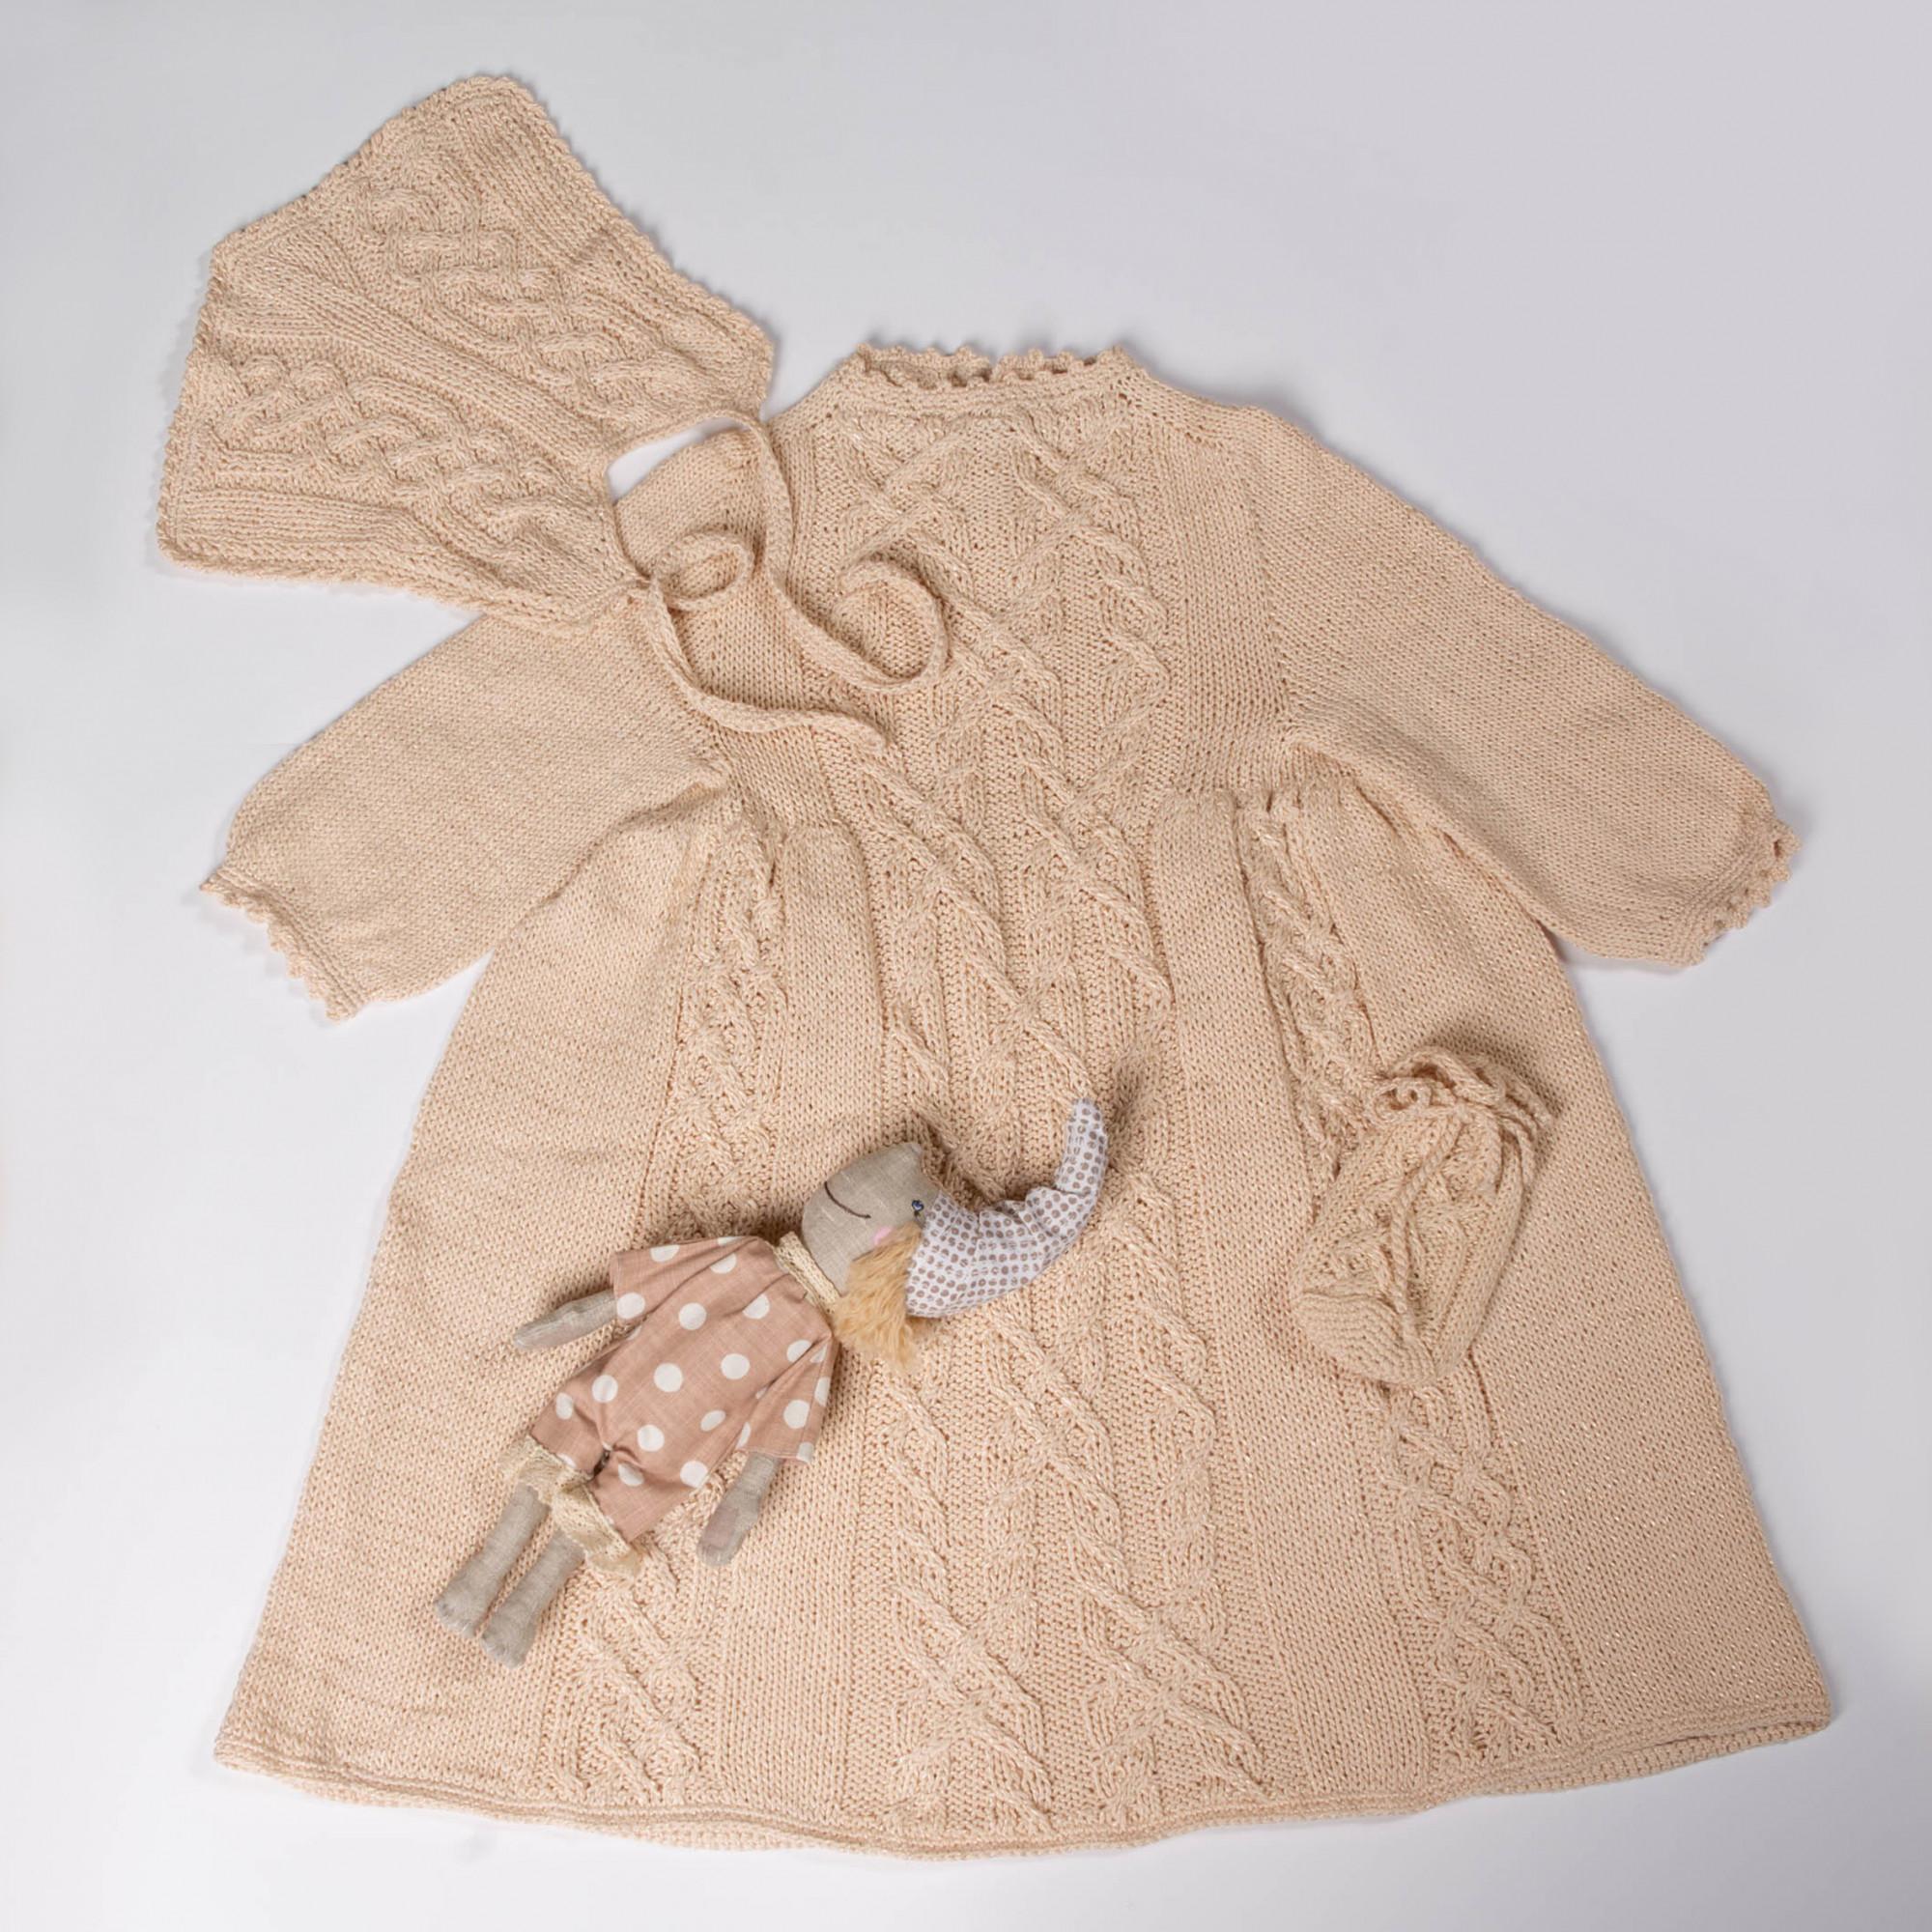 Handmade Christening Gown Boy Beige Dress